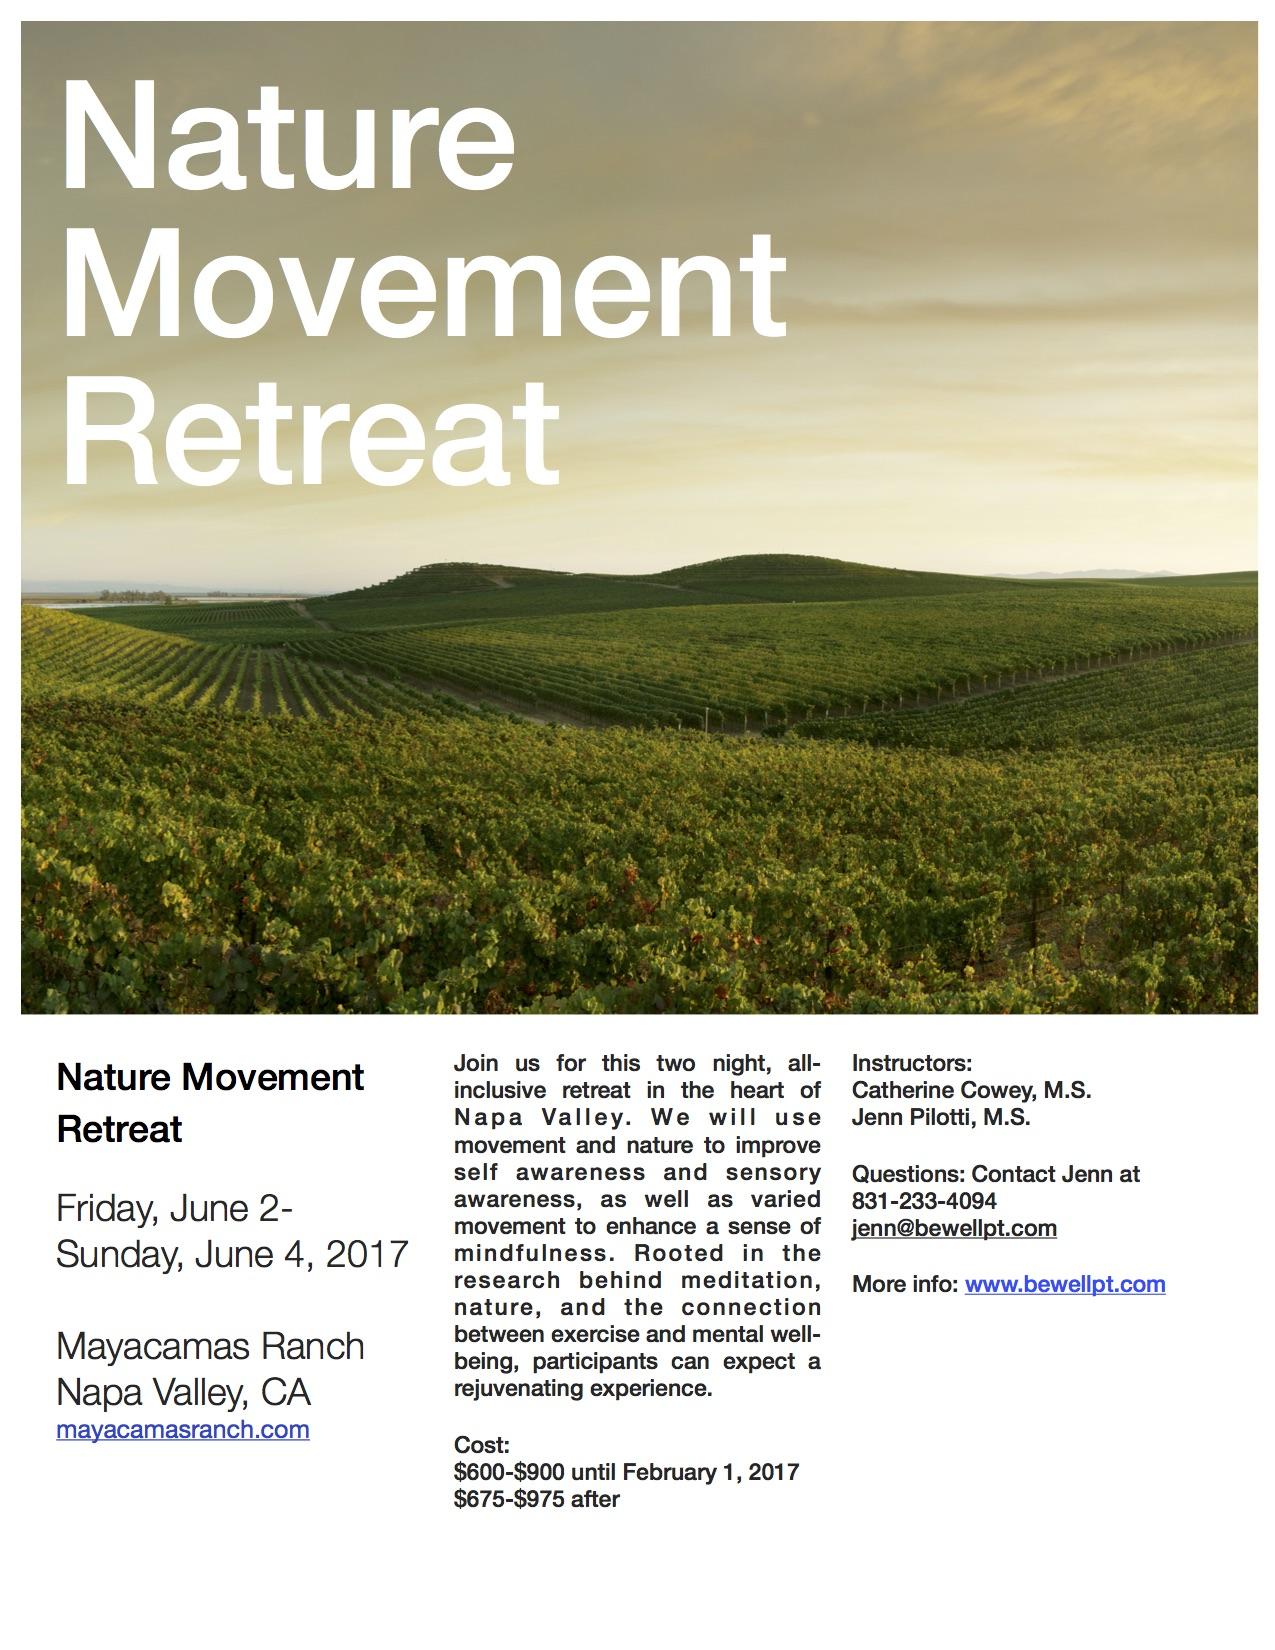 Nature Movement Retreat